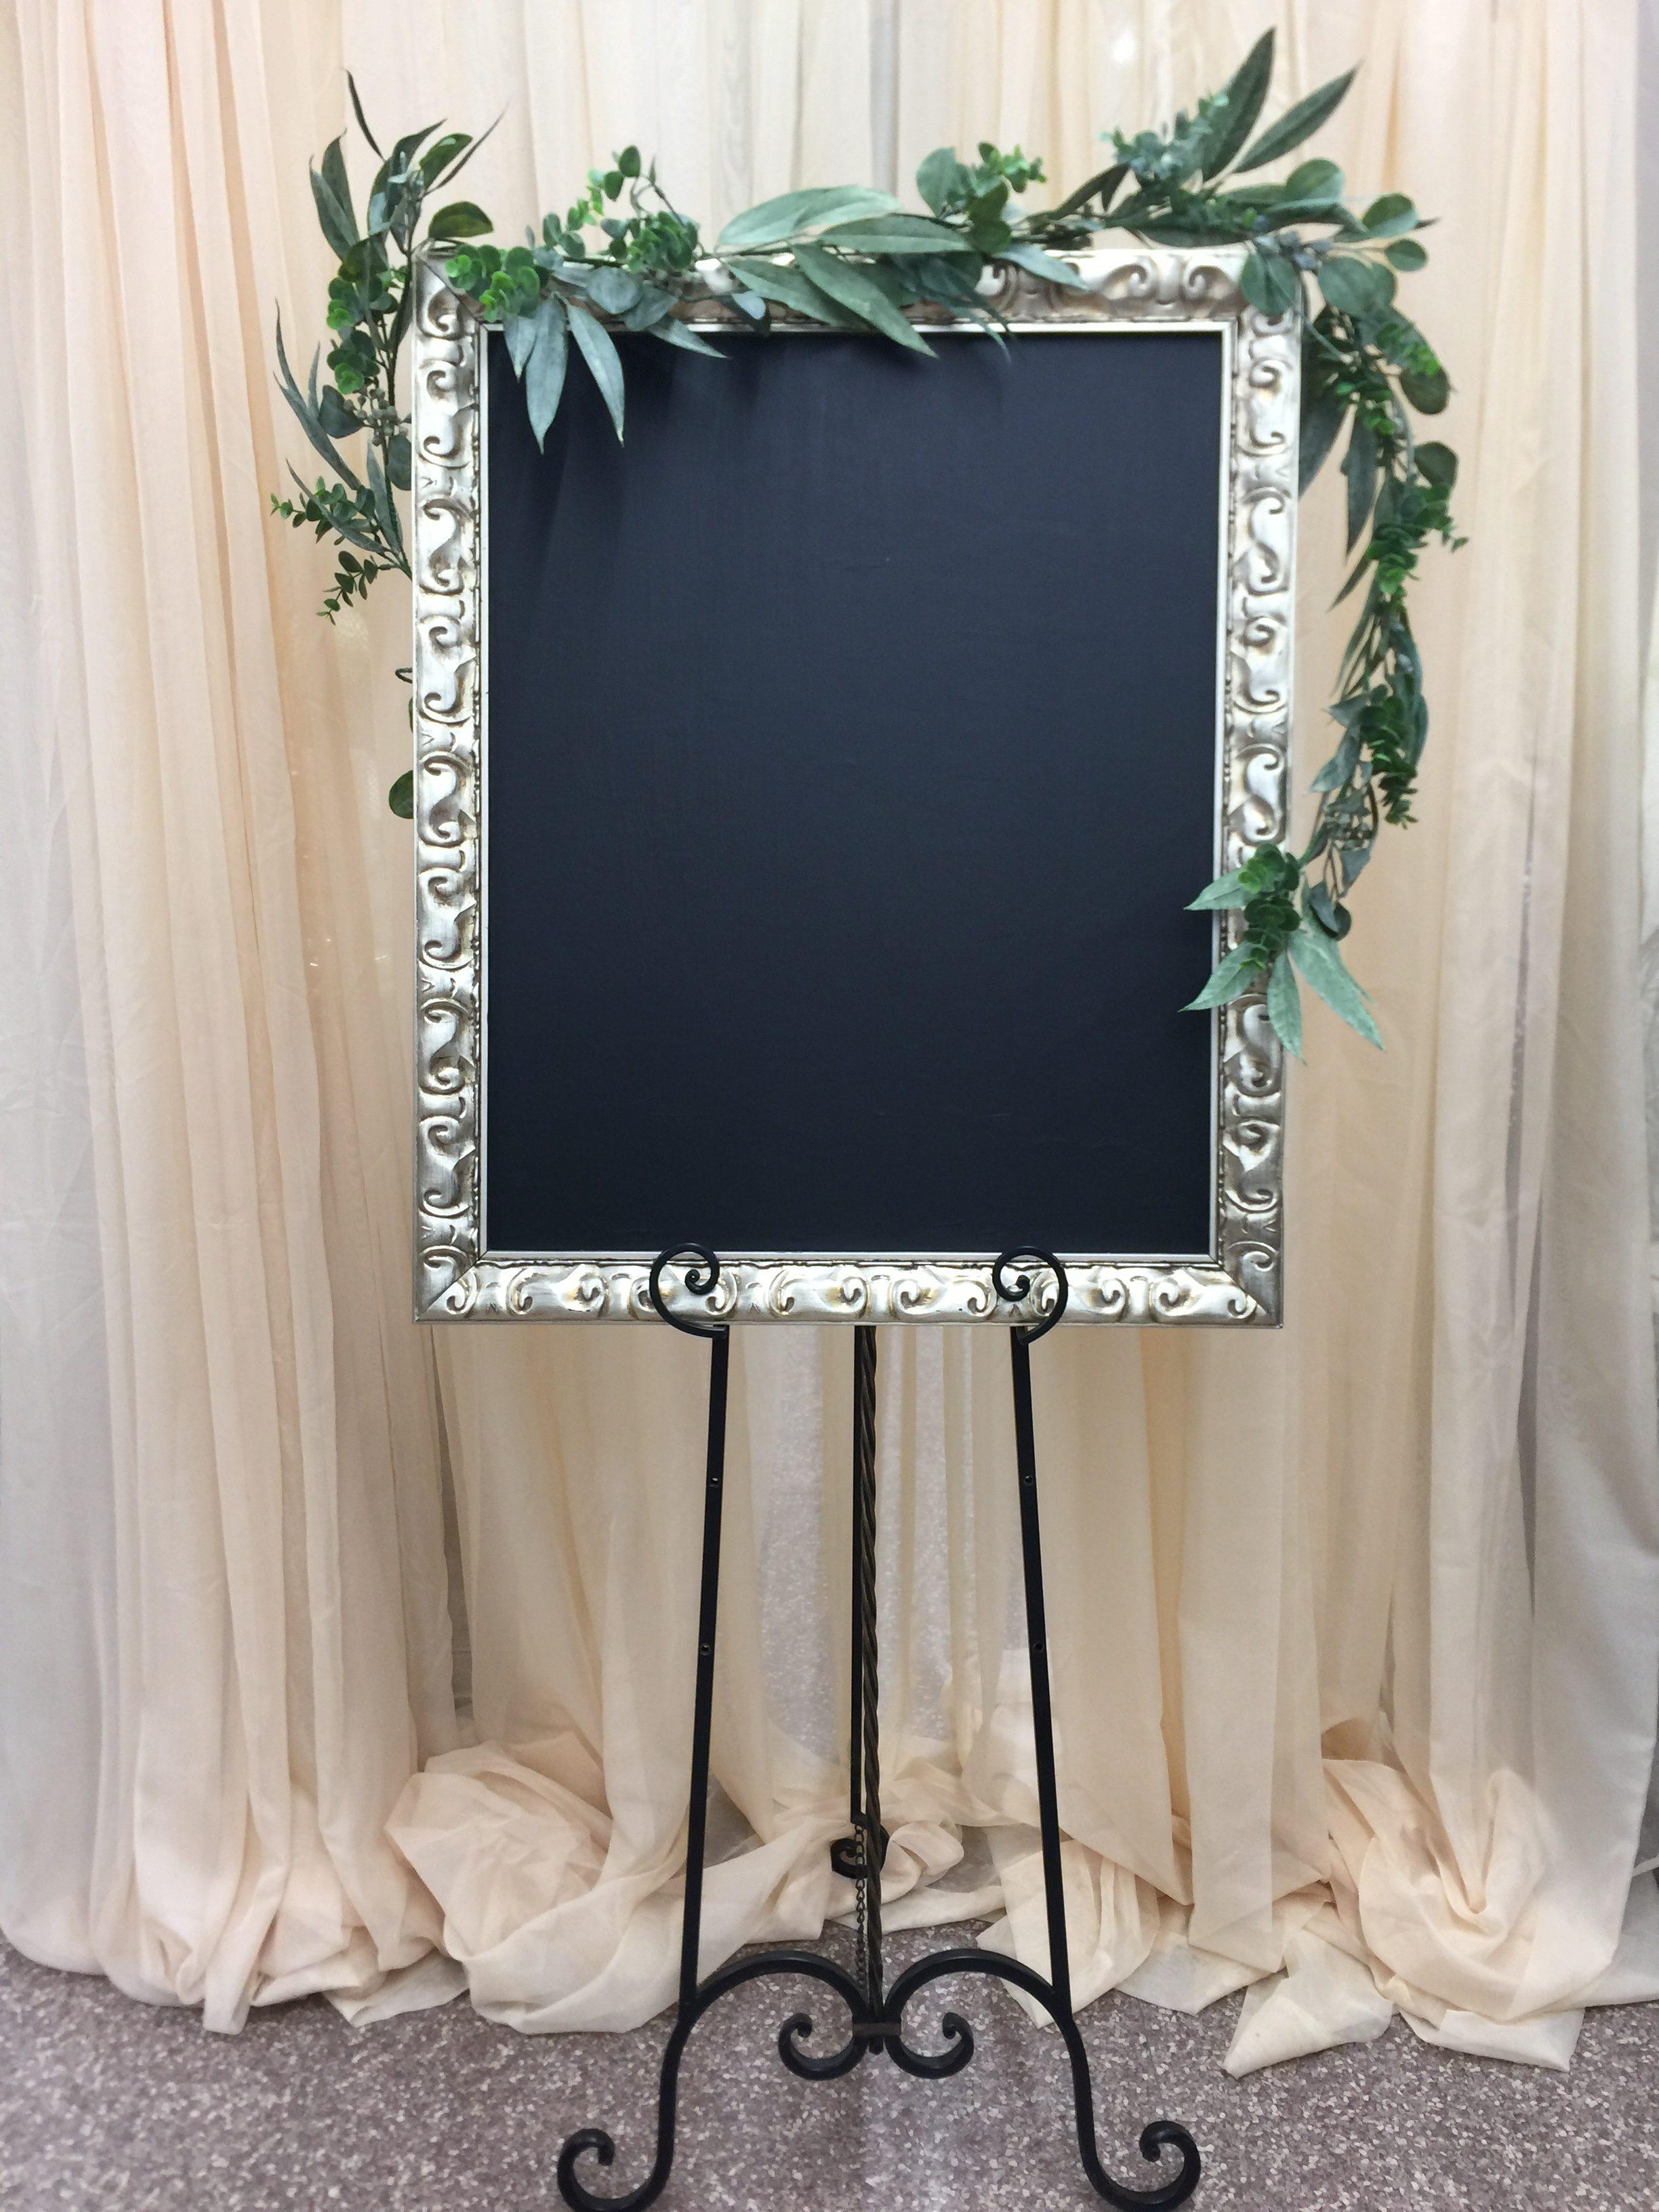 Large Champagne Chalkboard Image